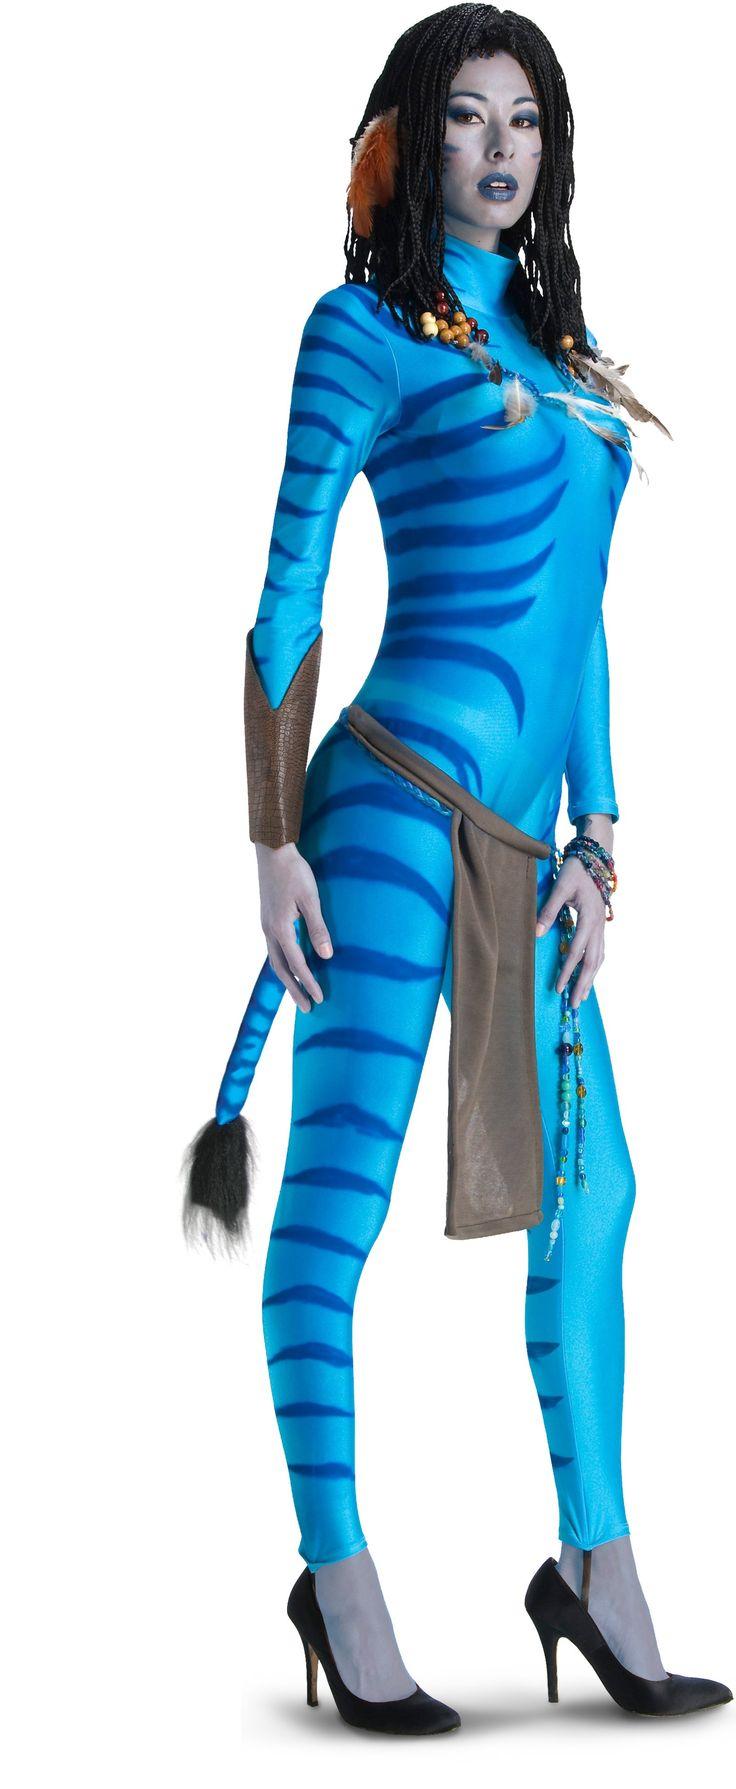 Avatar Movie Sexy Neytiri Adult Costume from Buycostumes.com